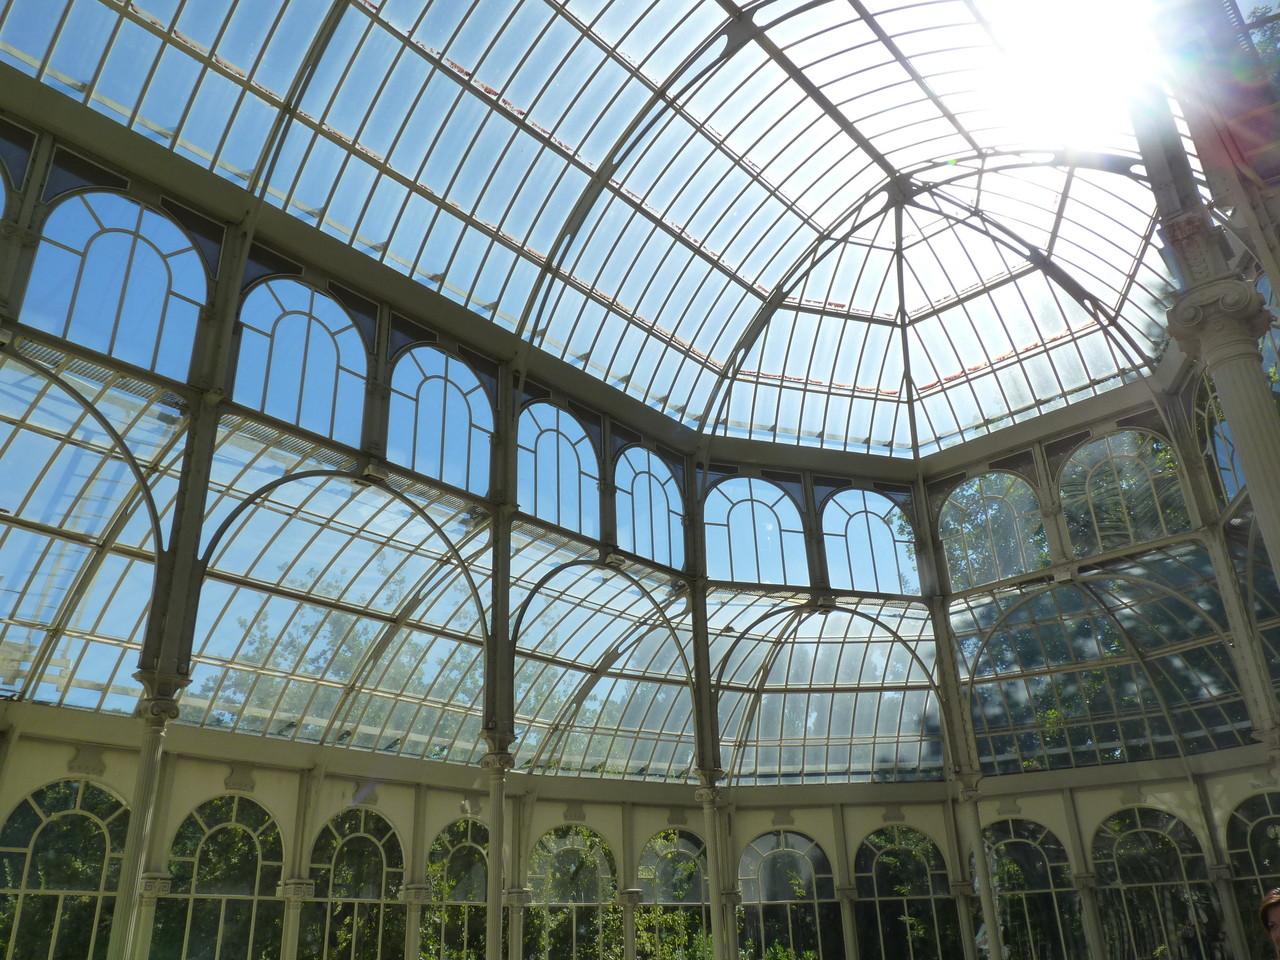 Romântica Madrid-Palácio de Cristal (8).JPG